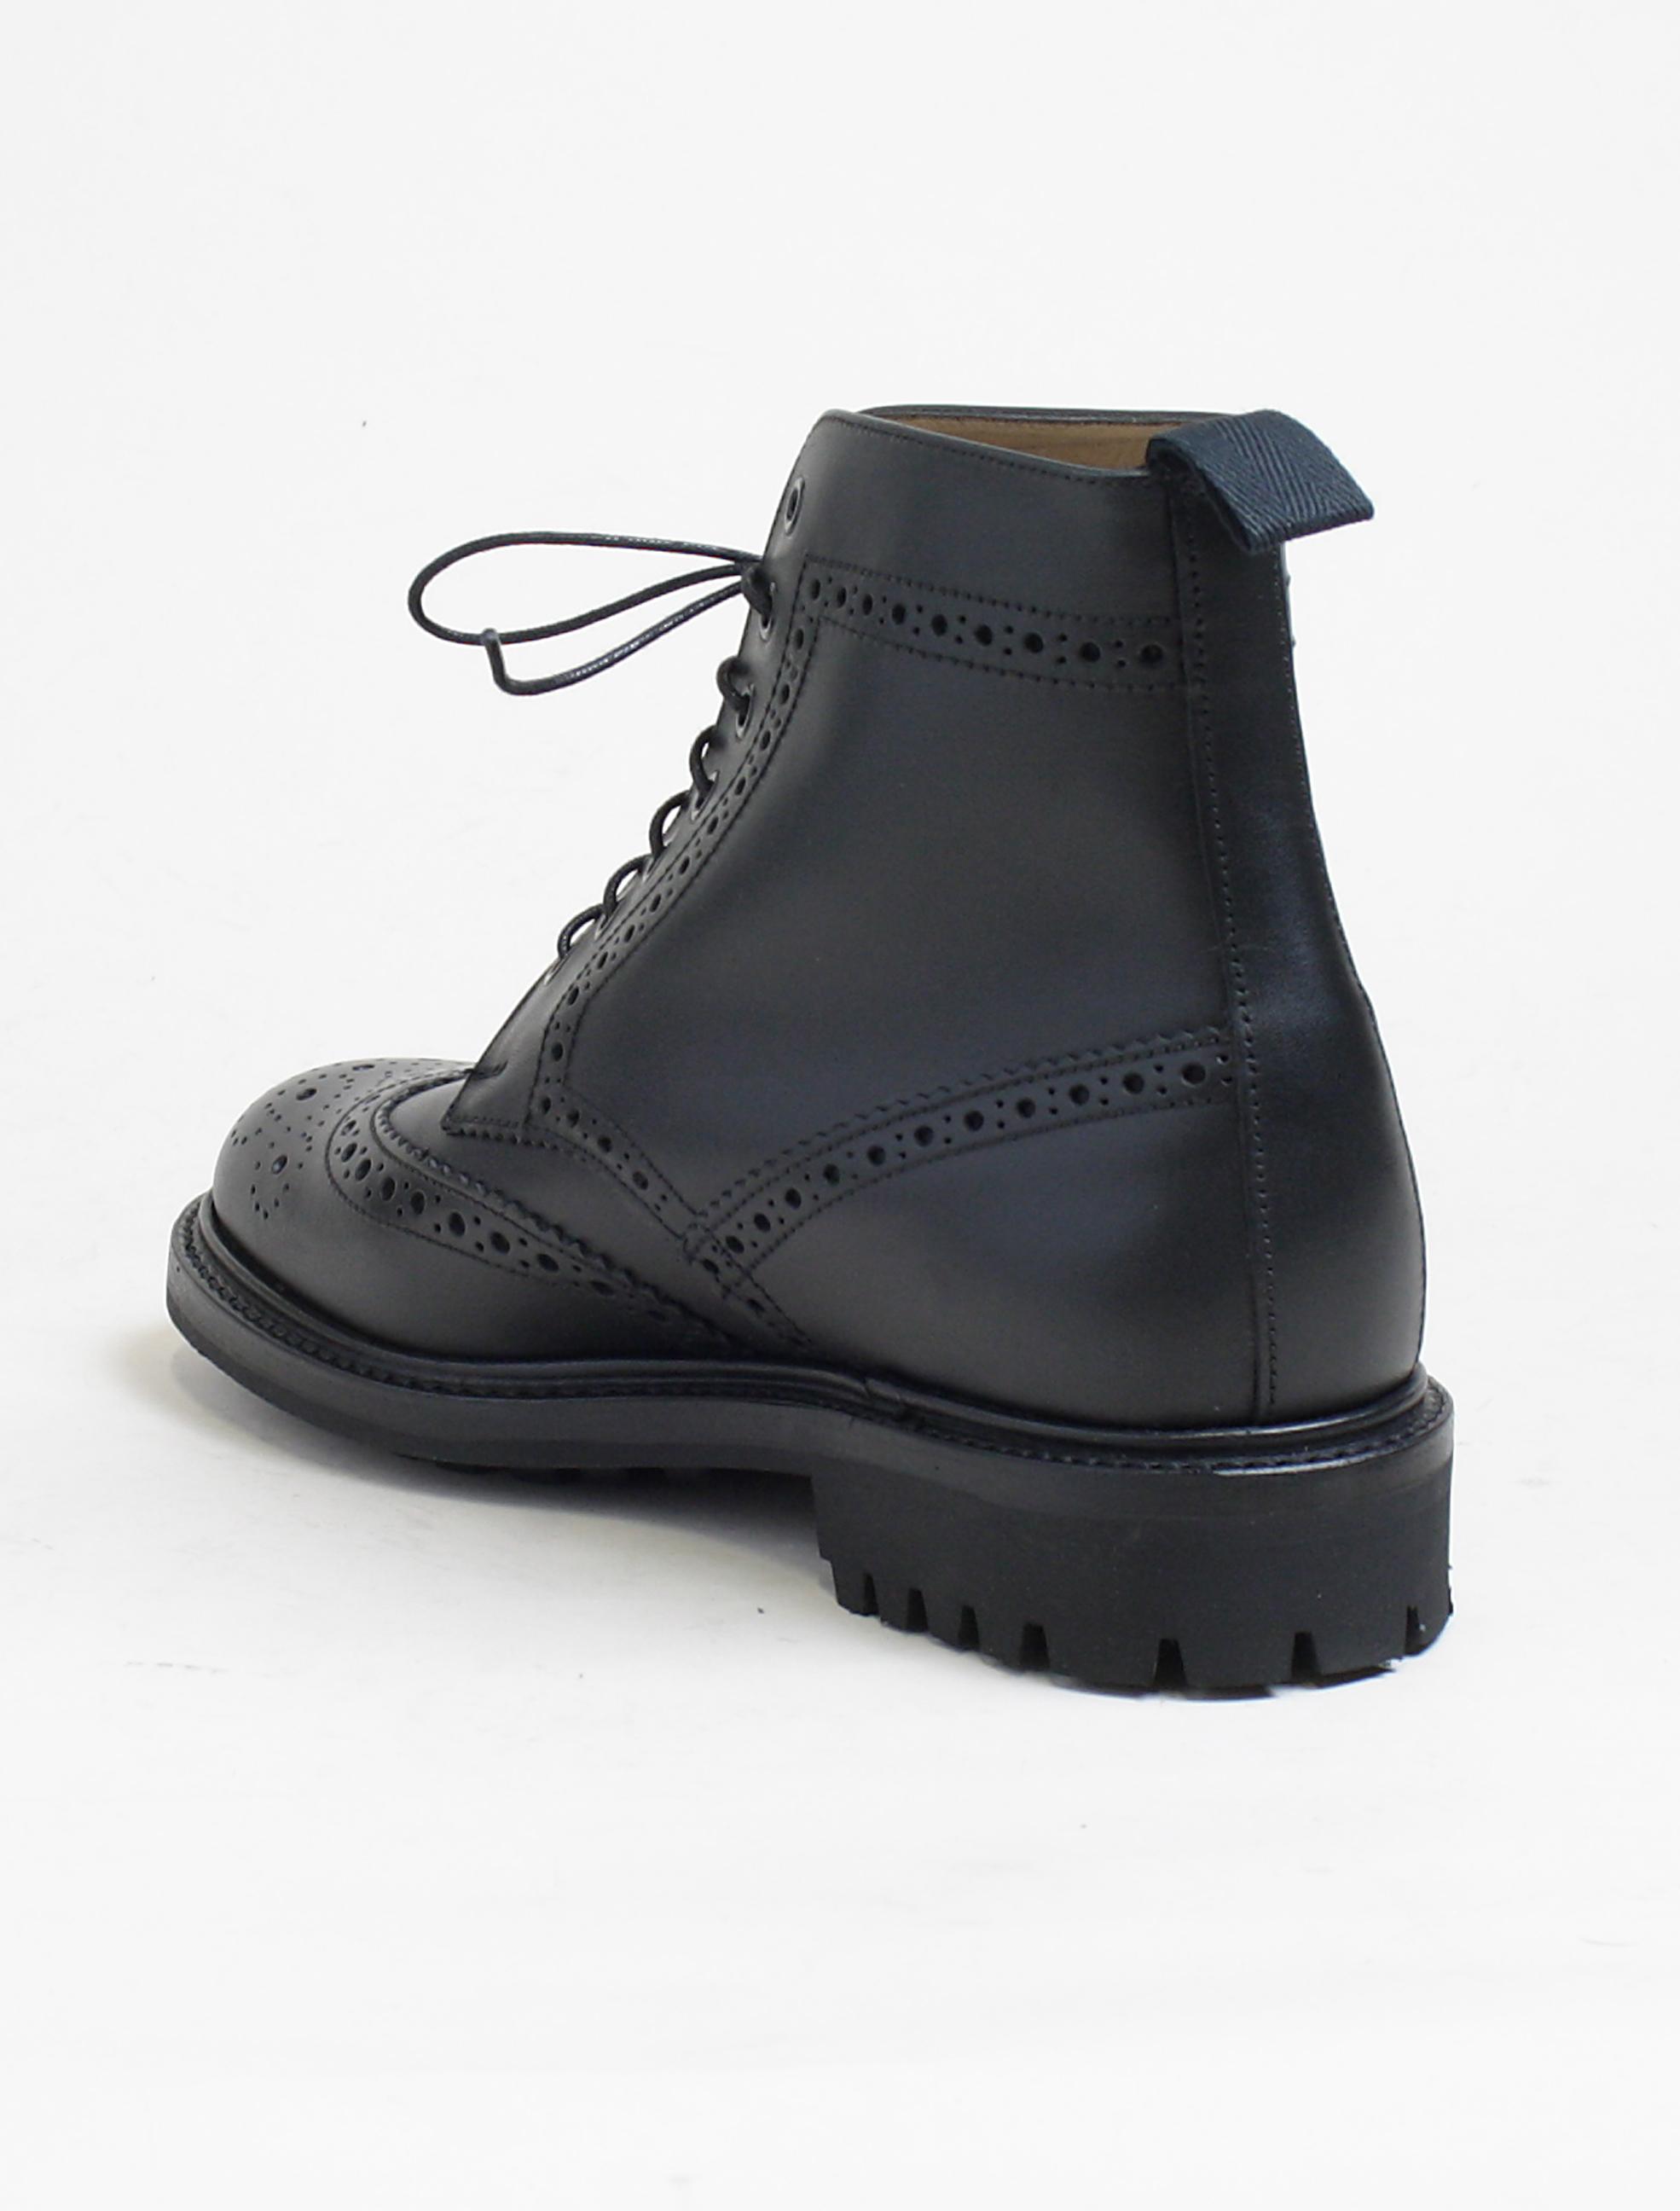 Sanders 8317 Cheltenham black brogue derby boot dettaglio tacco